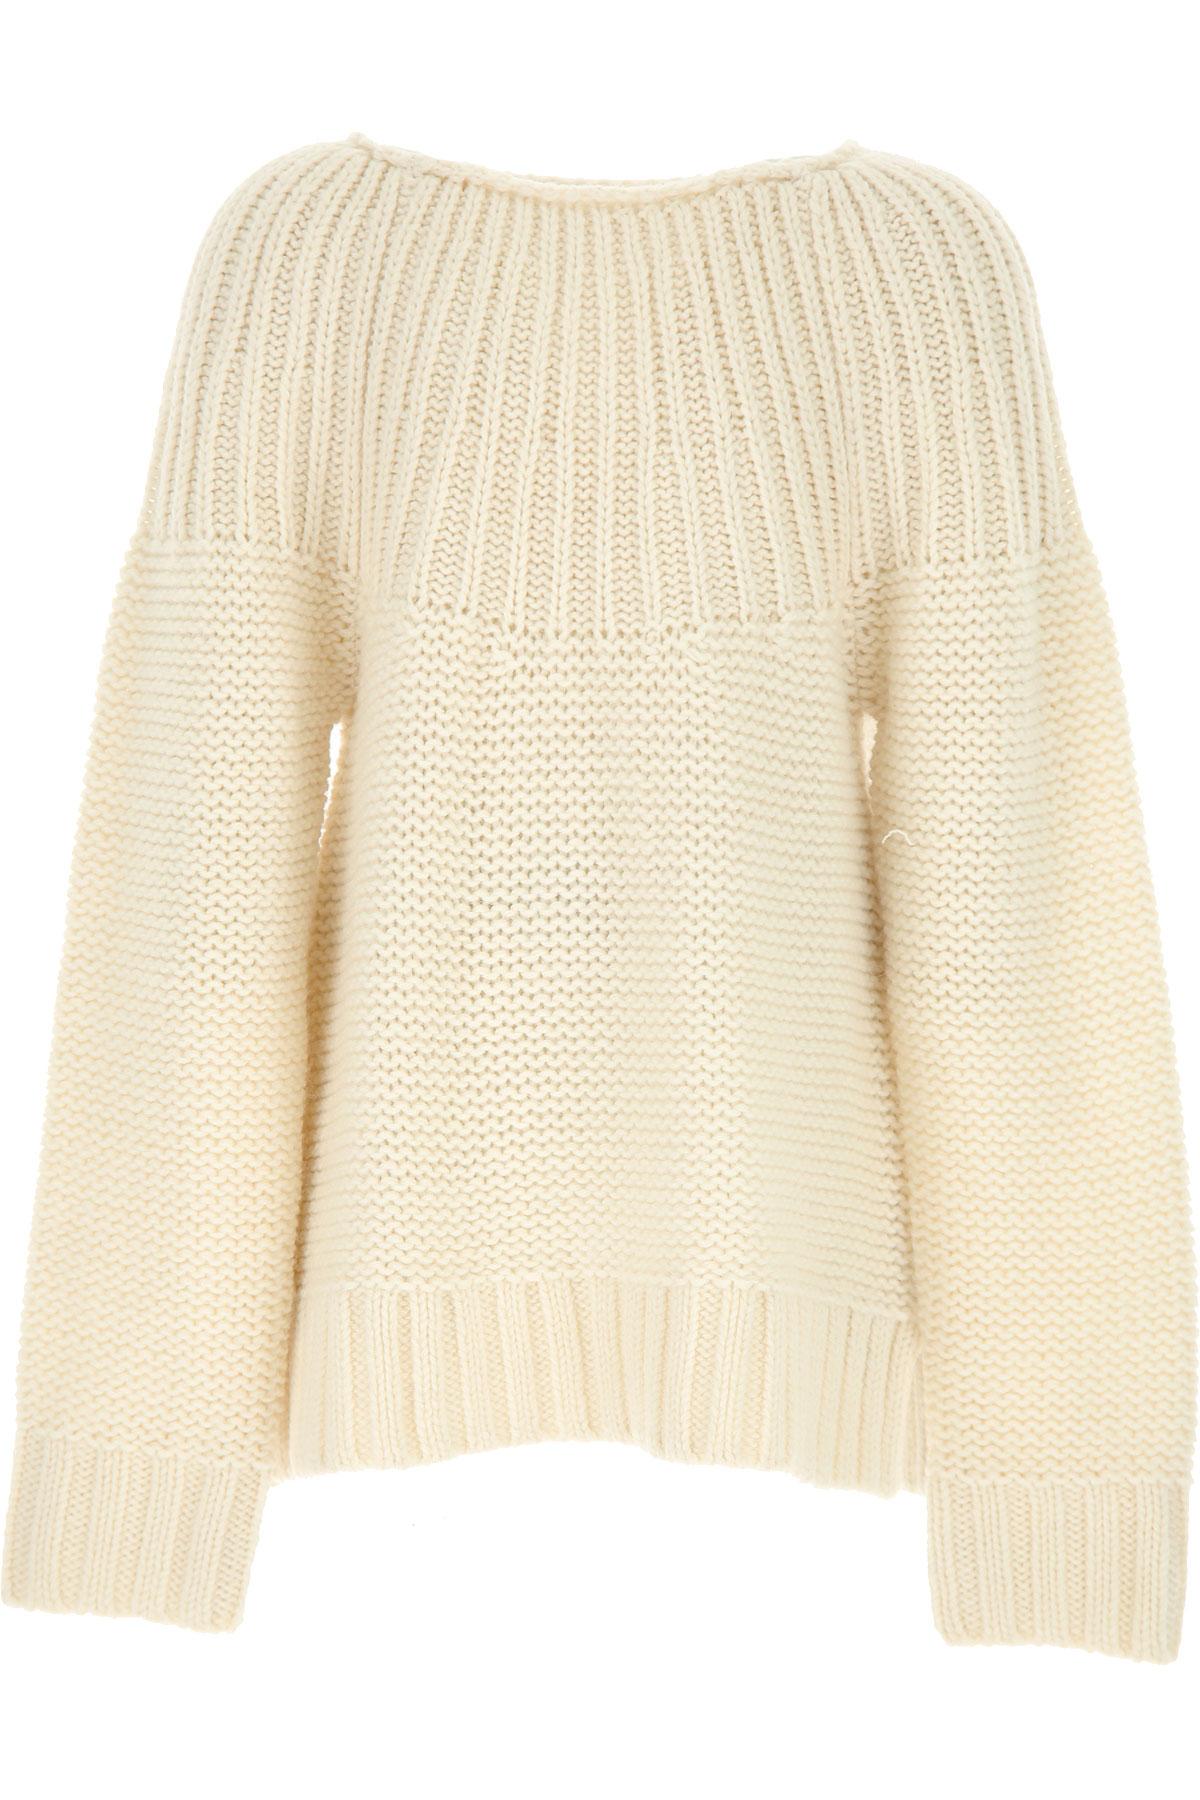 Bonpoint Kids Sweaters for Girls On Sale, Ecru, acetate, 2019, 10Y 14Y